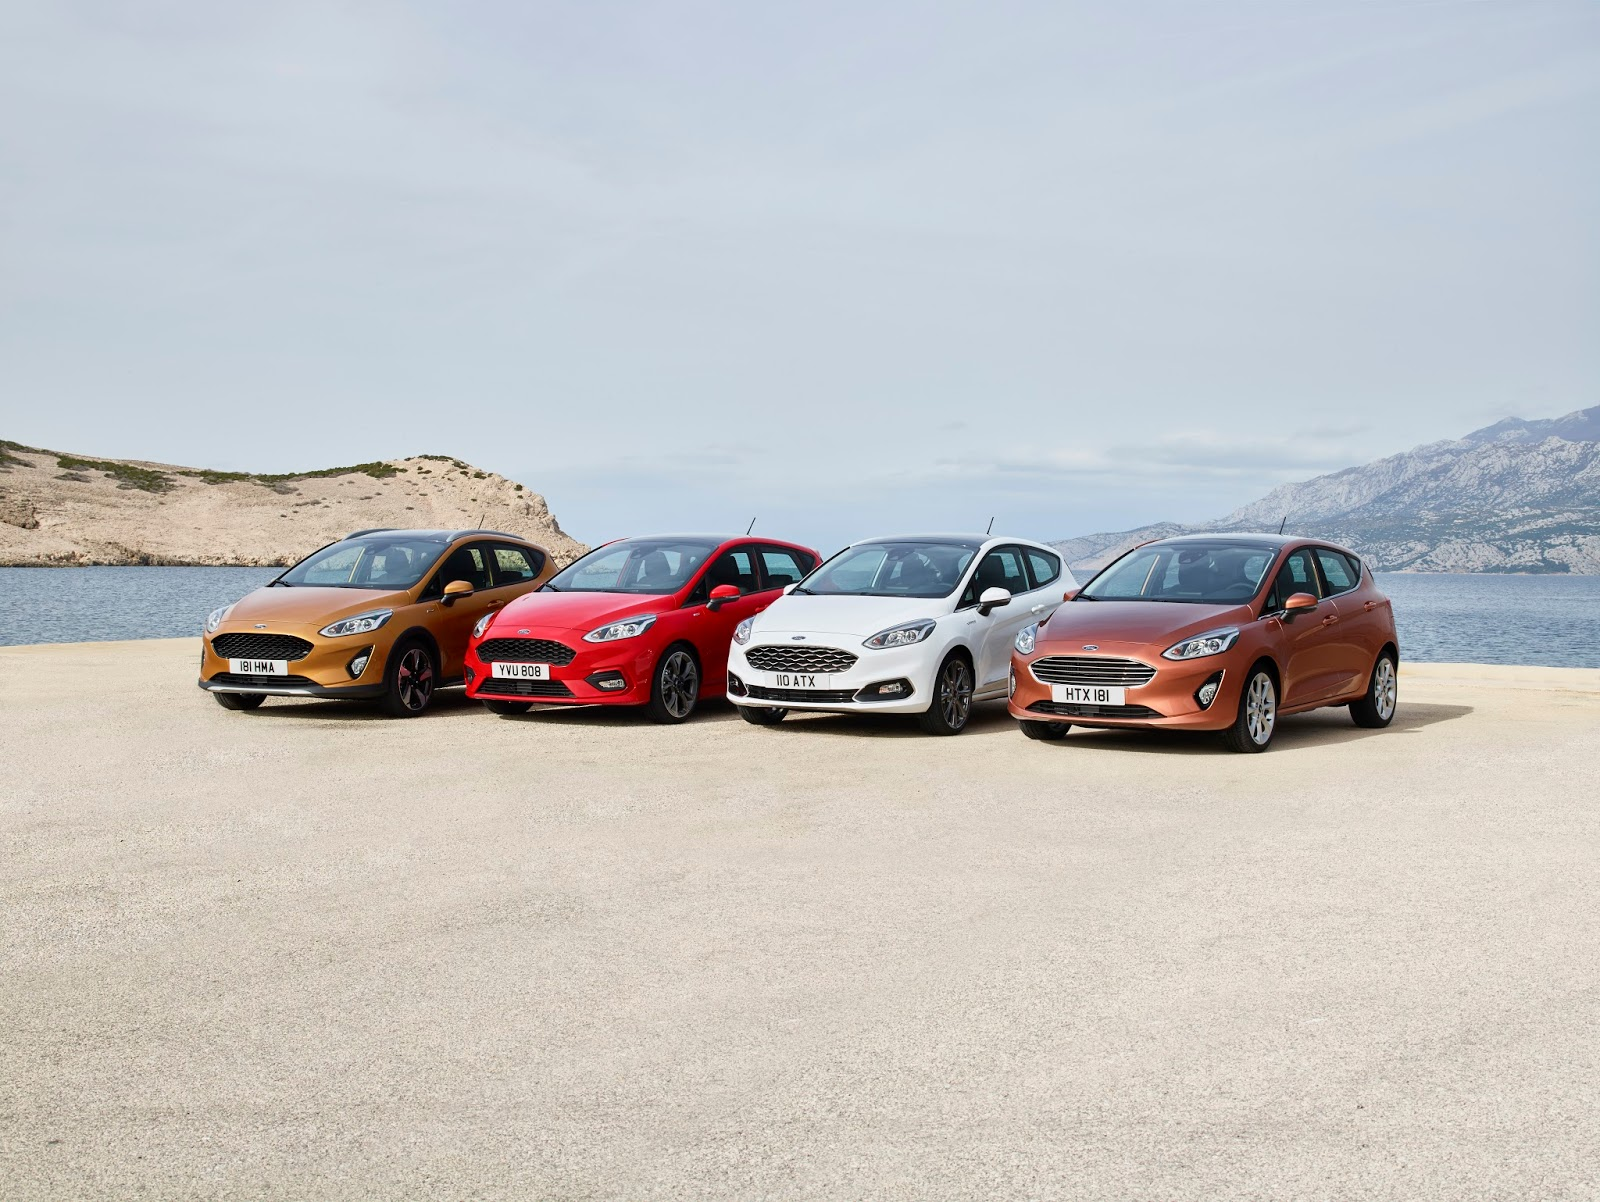 FORD FIESTA2016 RANGE 01 Τα πρώτα Ford Fiesta έρχονται στην Ελλάδα, με τιμή από 12.990€ Bestseller, Ford, Ford Fiesta, supermini, Λανσάρισμα